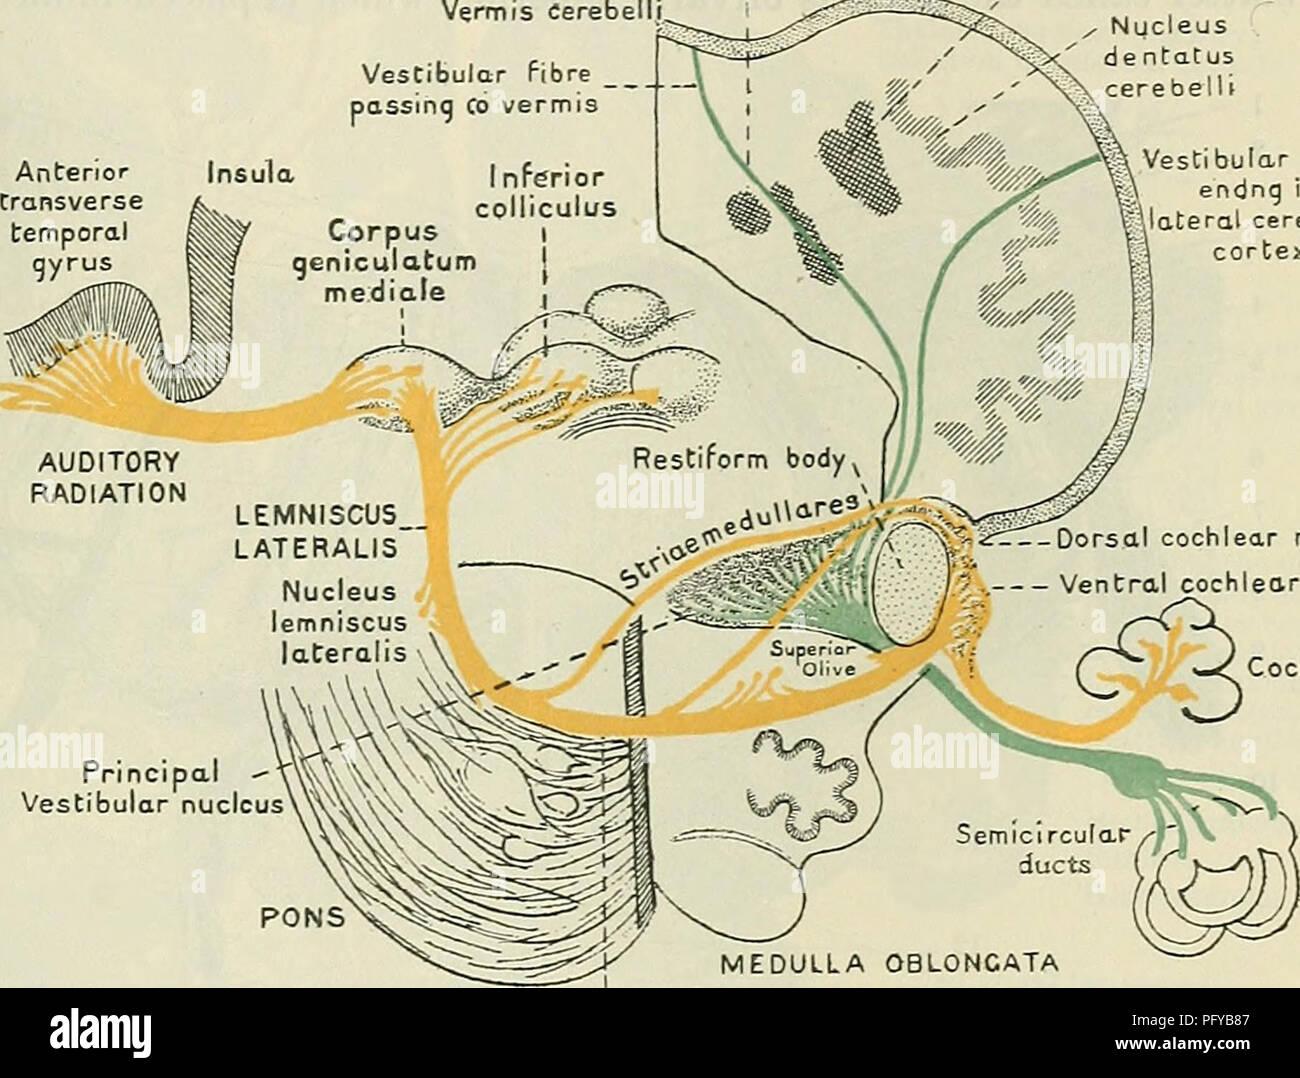 Cunninghams Text Book Of Anatomy Anatomy The Deep Connexions Oe